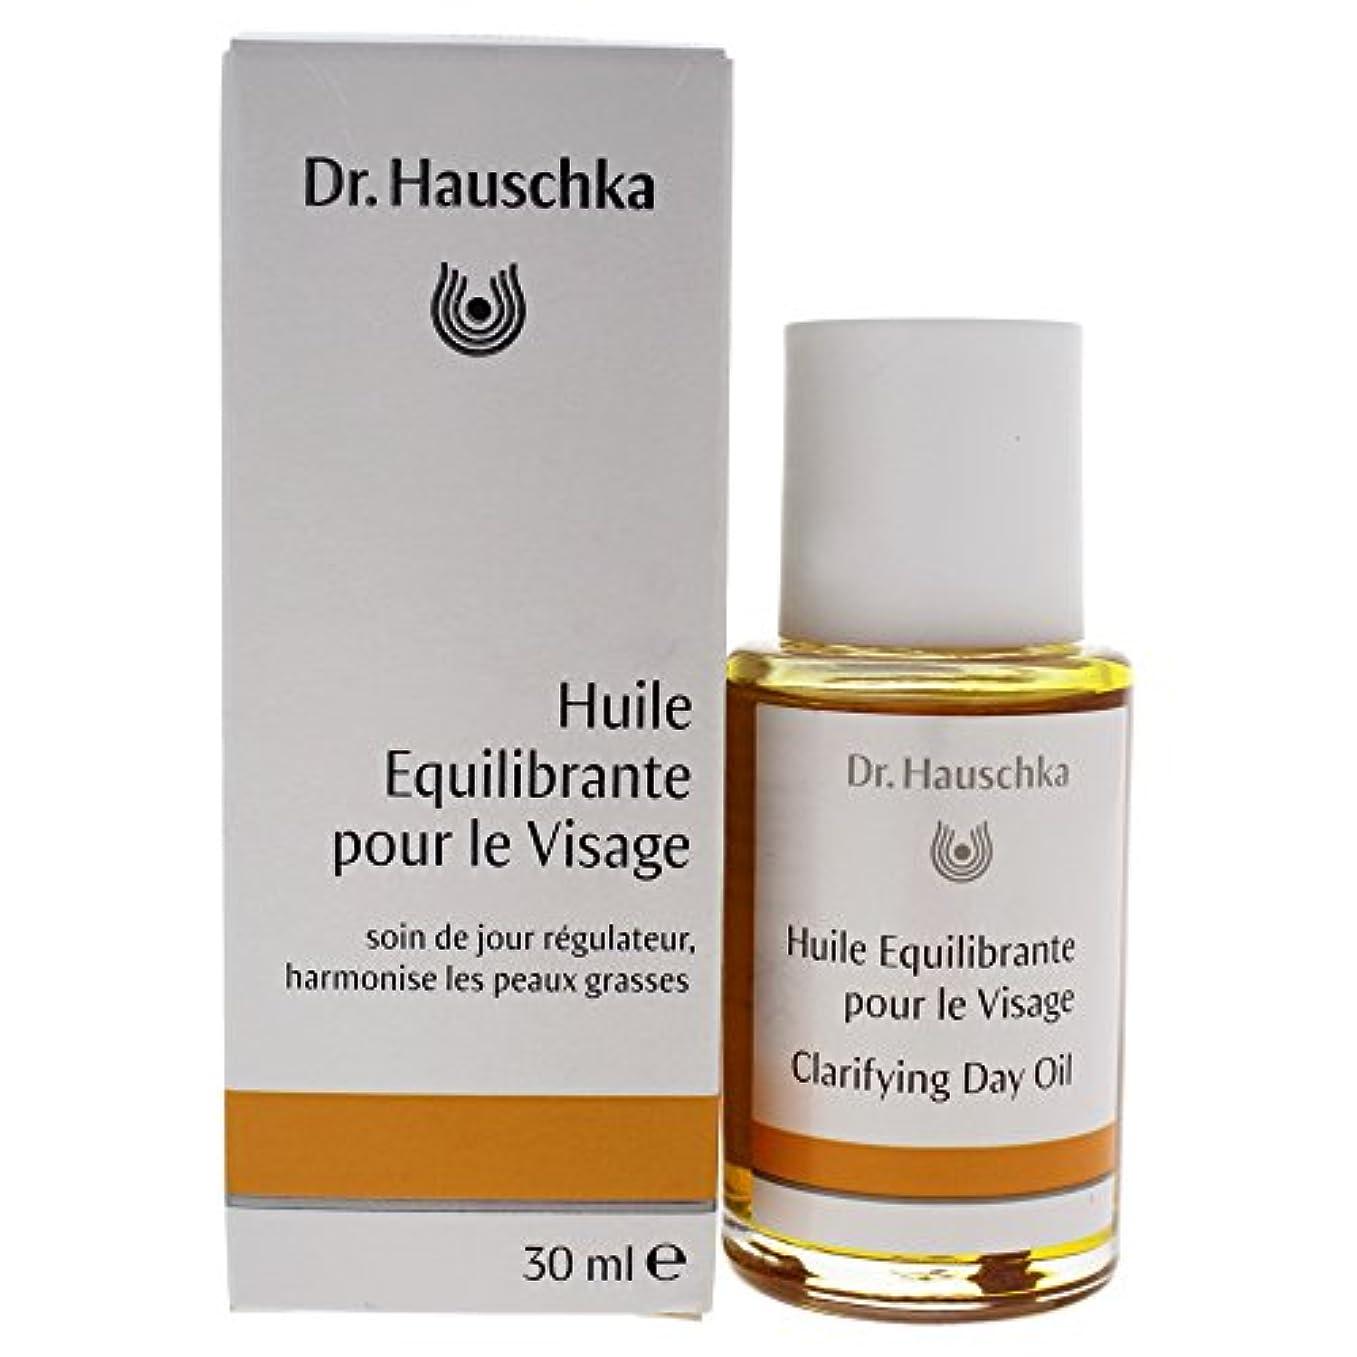 Dr.Hauschka(ドクターハウシュカ) クラリファイング デイオイル 30ml [並行輸入品]